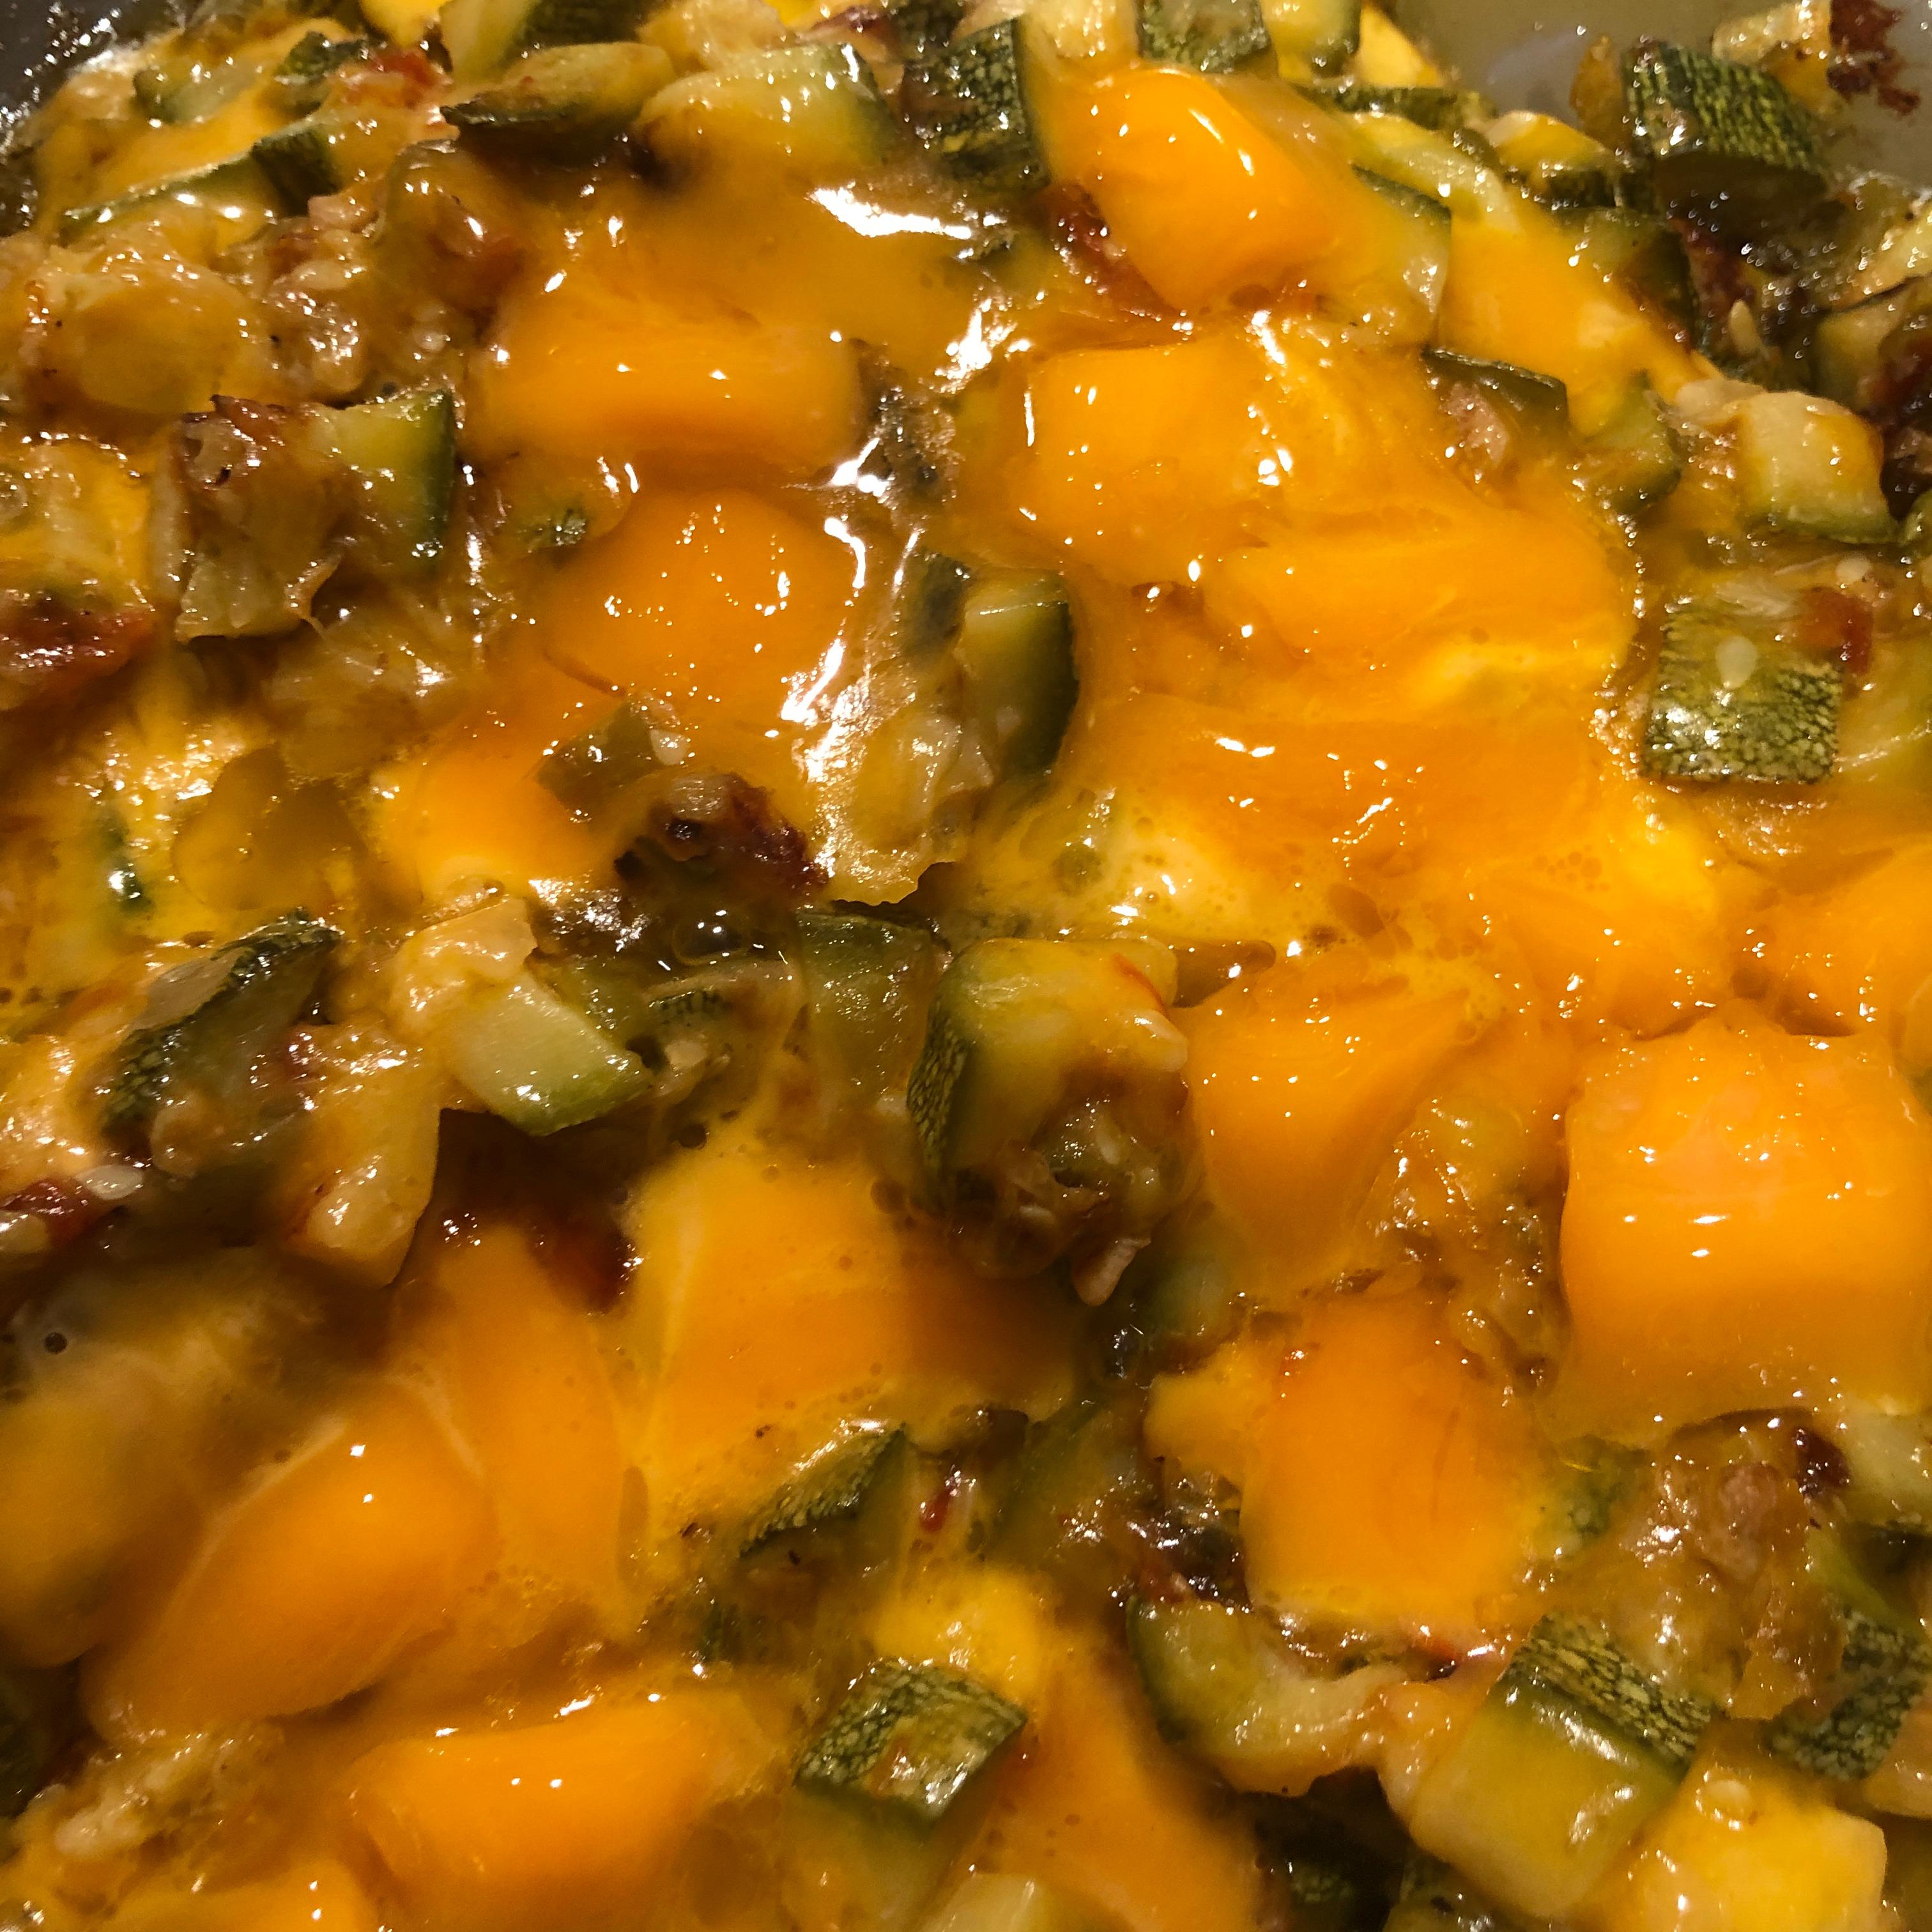 Calabacitas Con Queso (Squash with Cheese) CRC